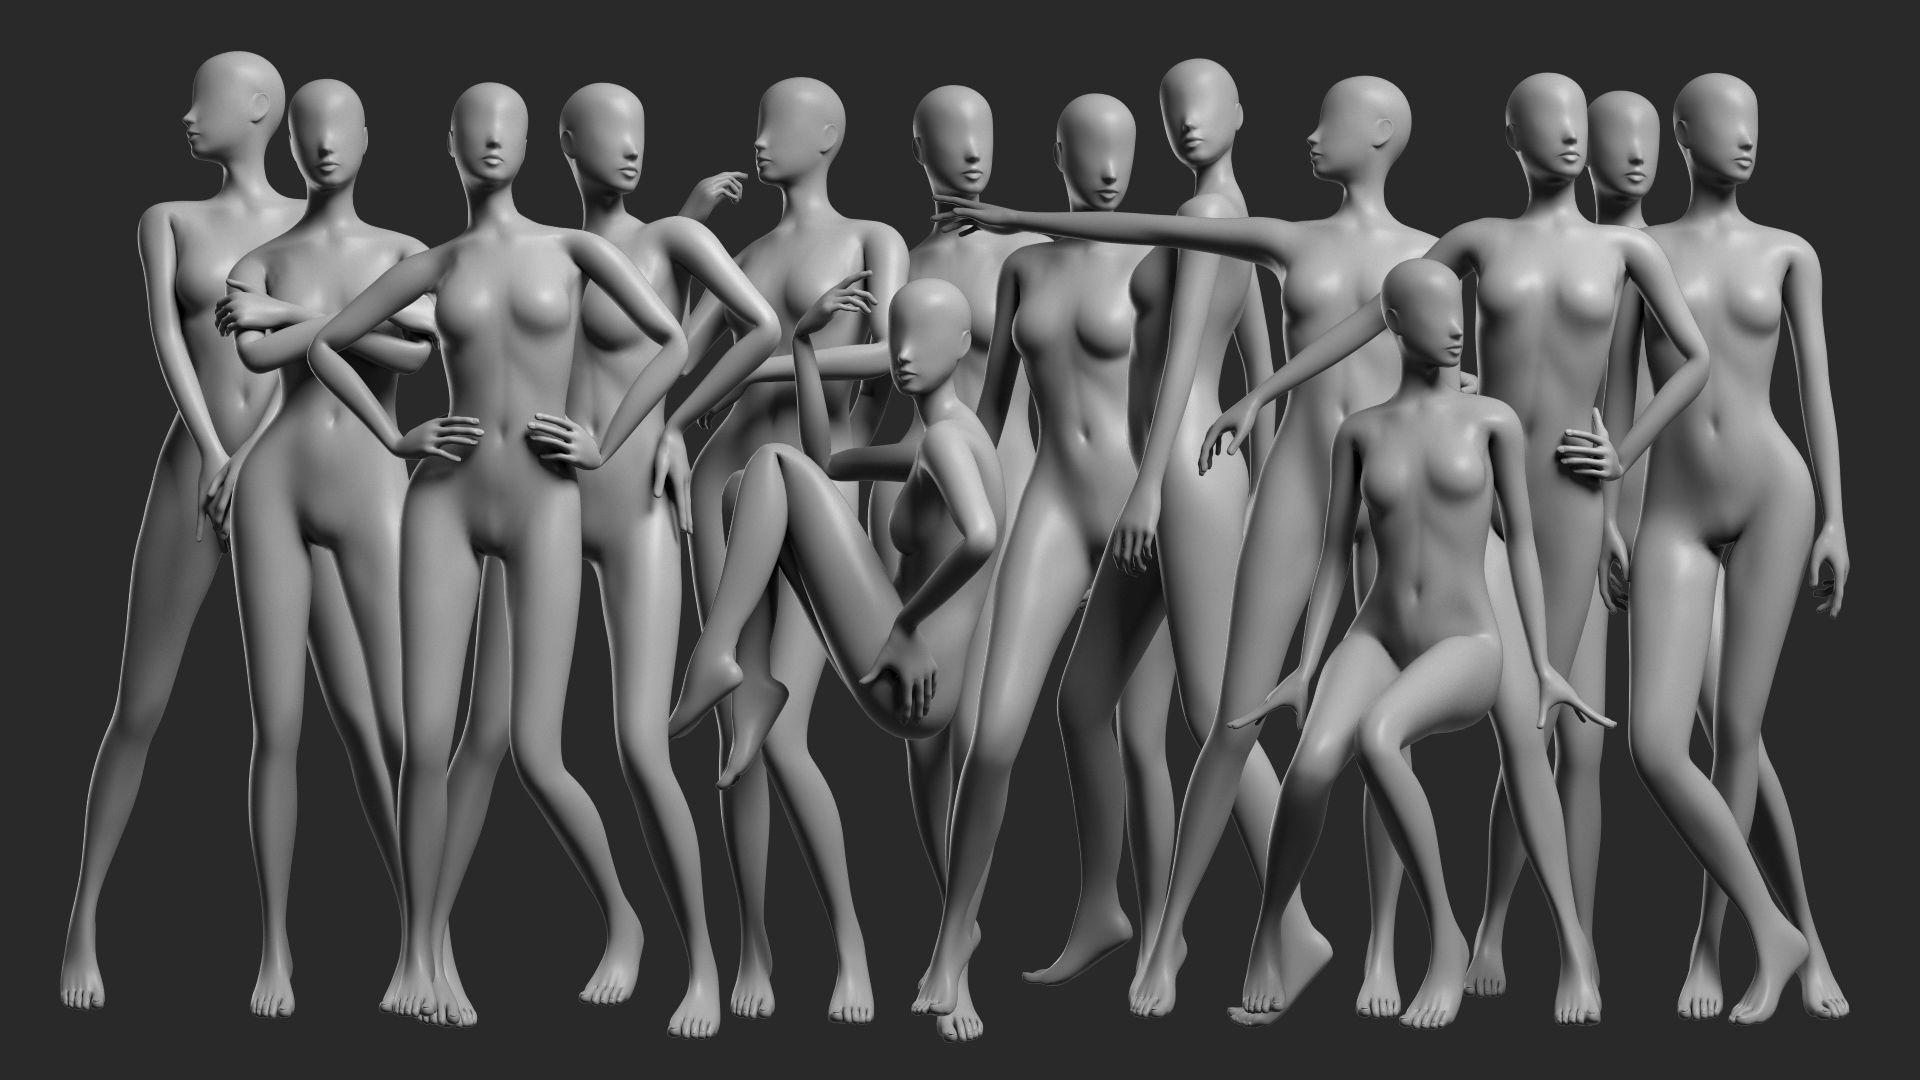 Animated Female Mesh - 14 poses v2